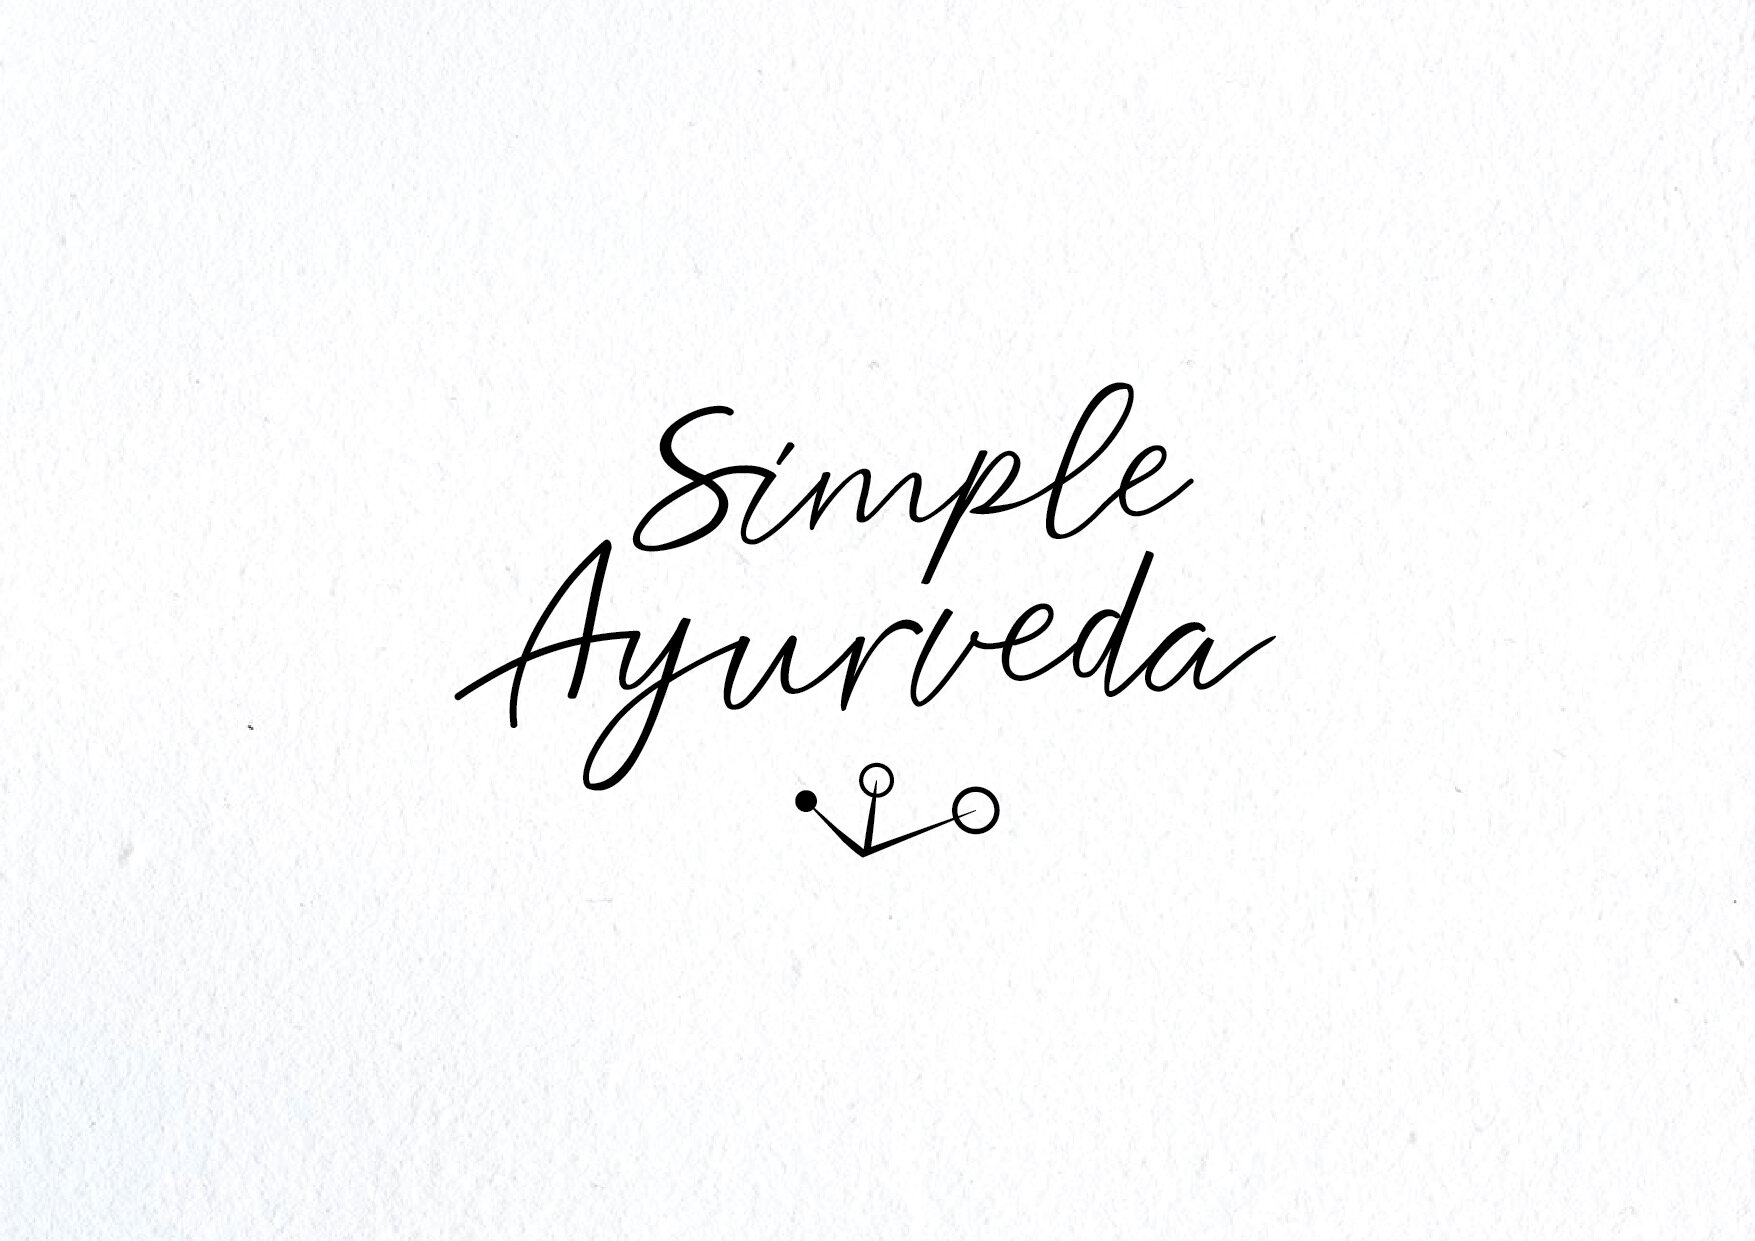 Simply Ayurveda presentation-03.jpg